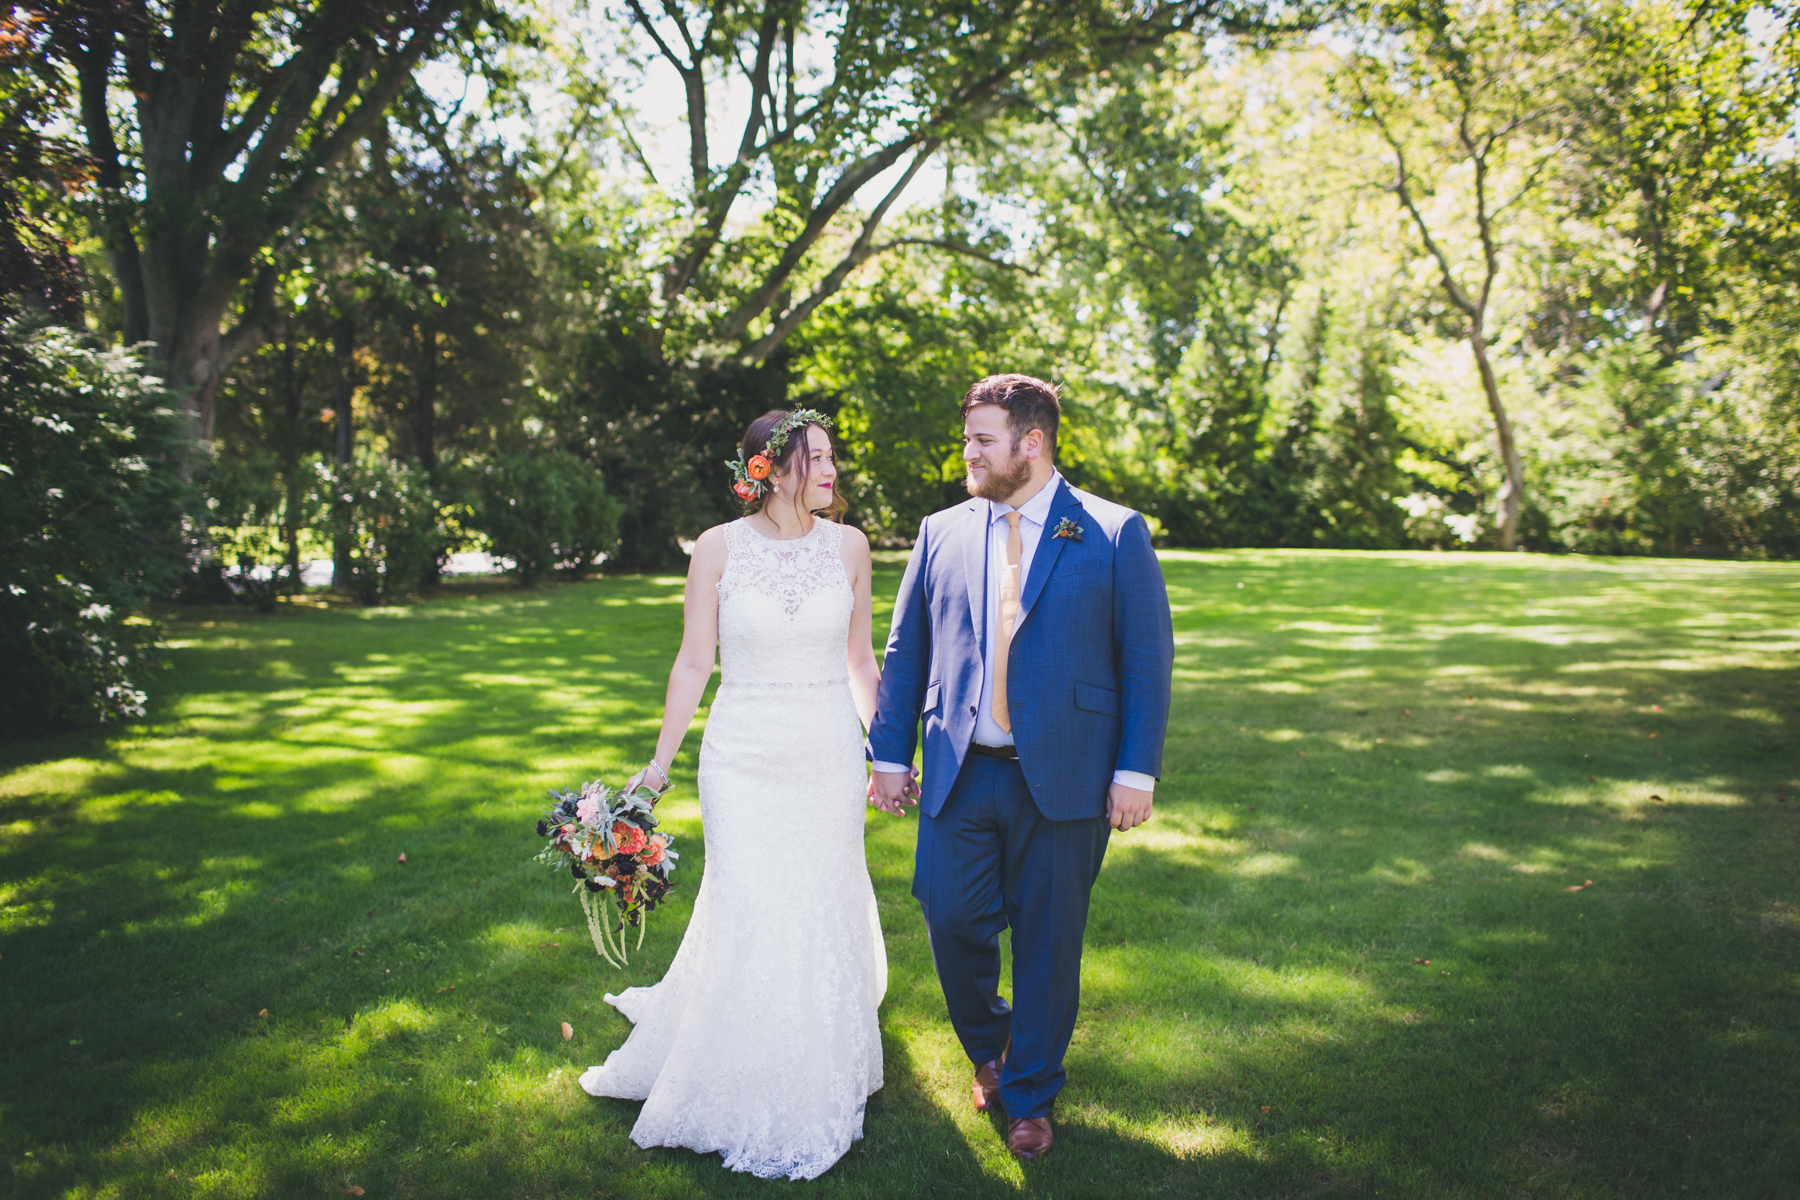 Long-Island-Documentary-Wedding-Photography-Summer-Tent-Wedding-in-New-York-33.jpg